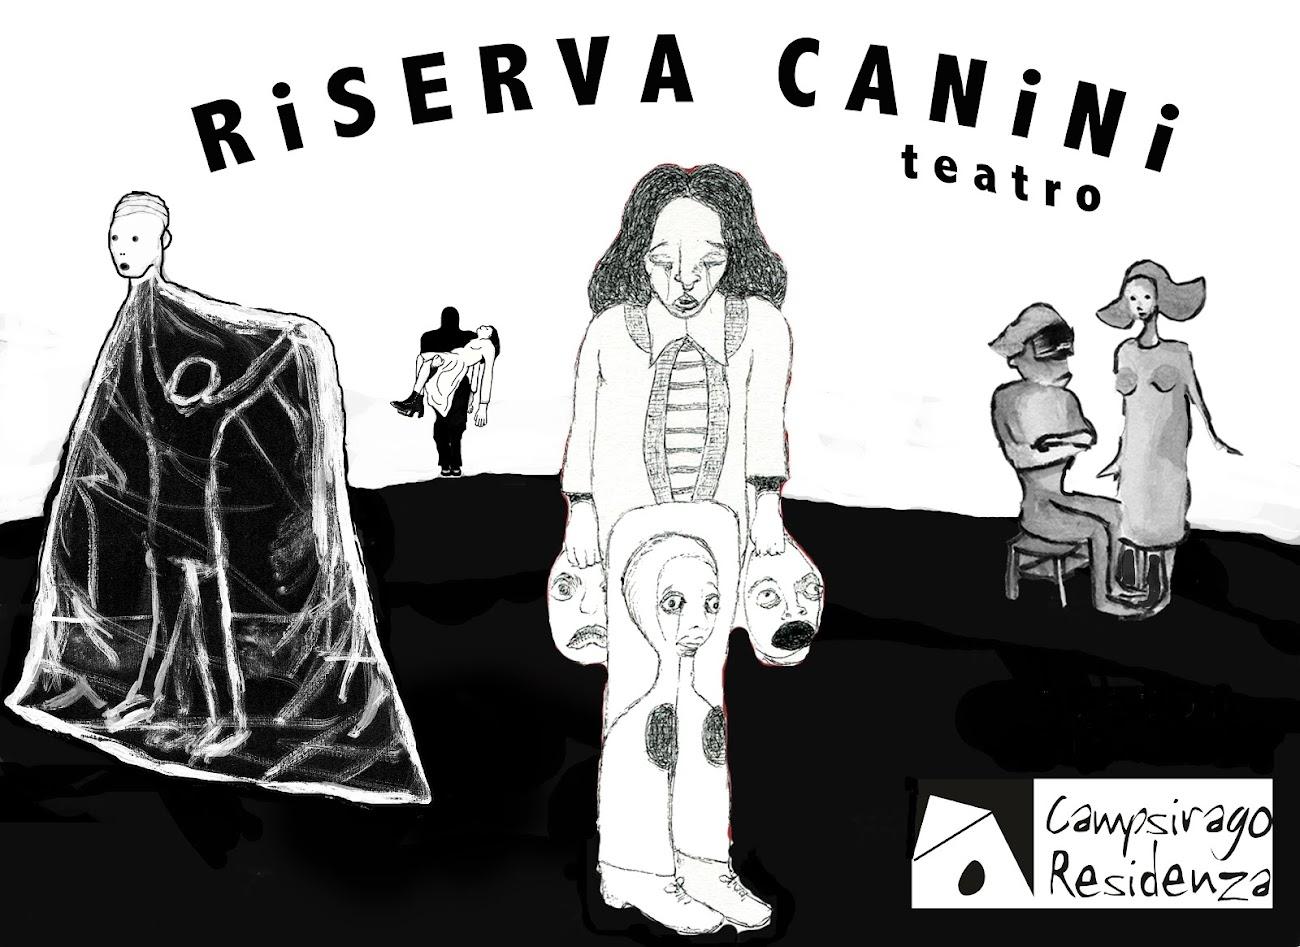 RISERVA CANINI TEATRO